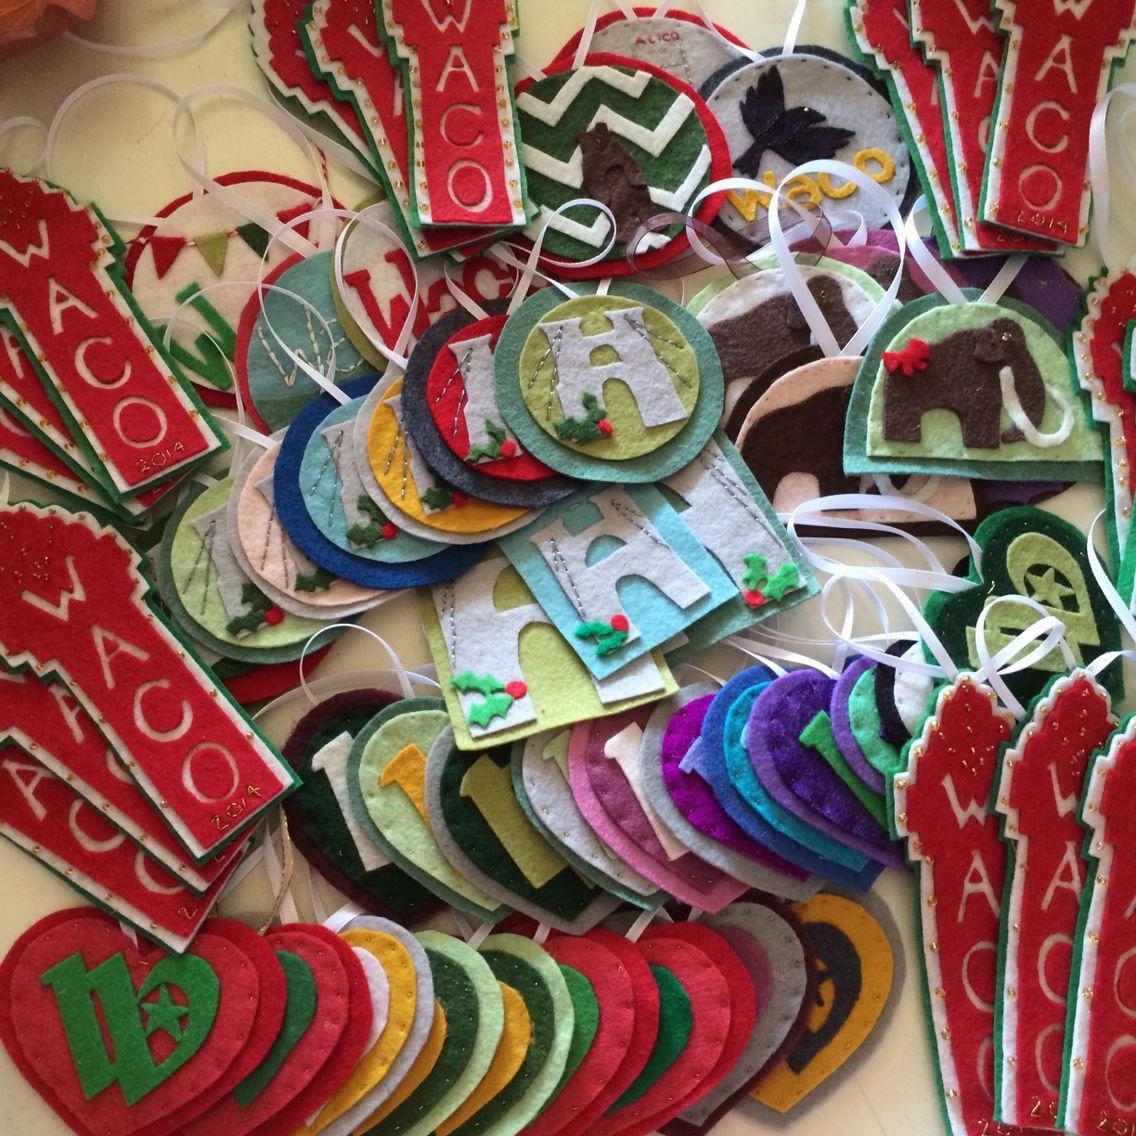 Waco ornaments